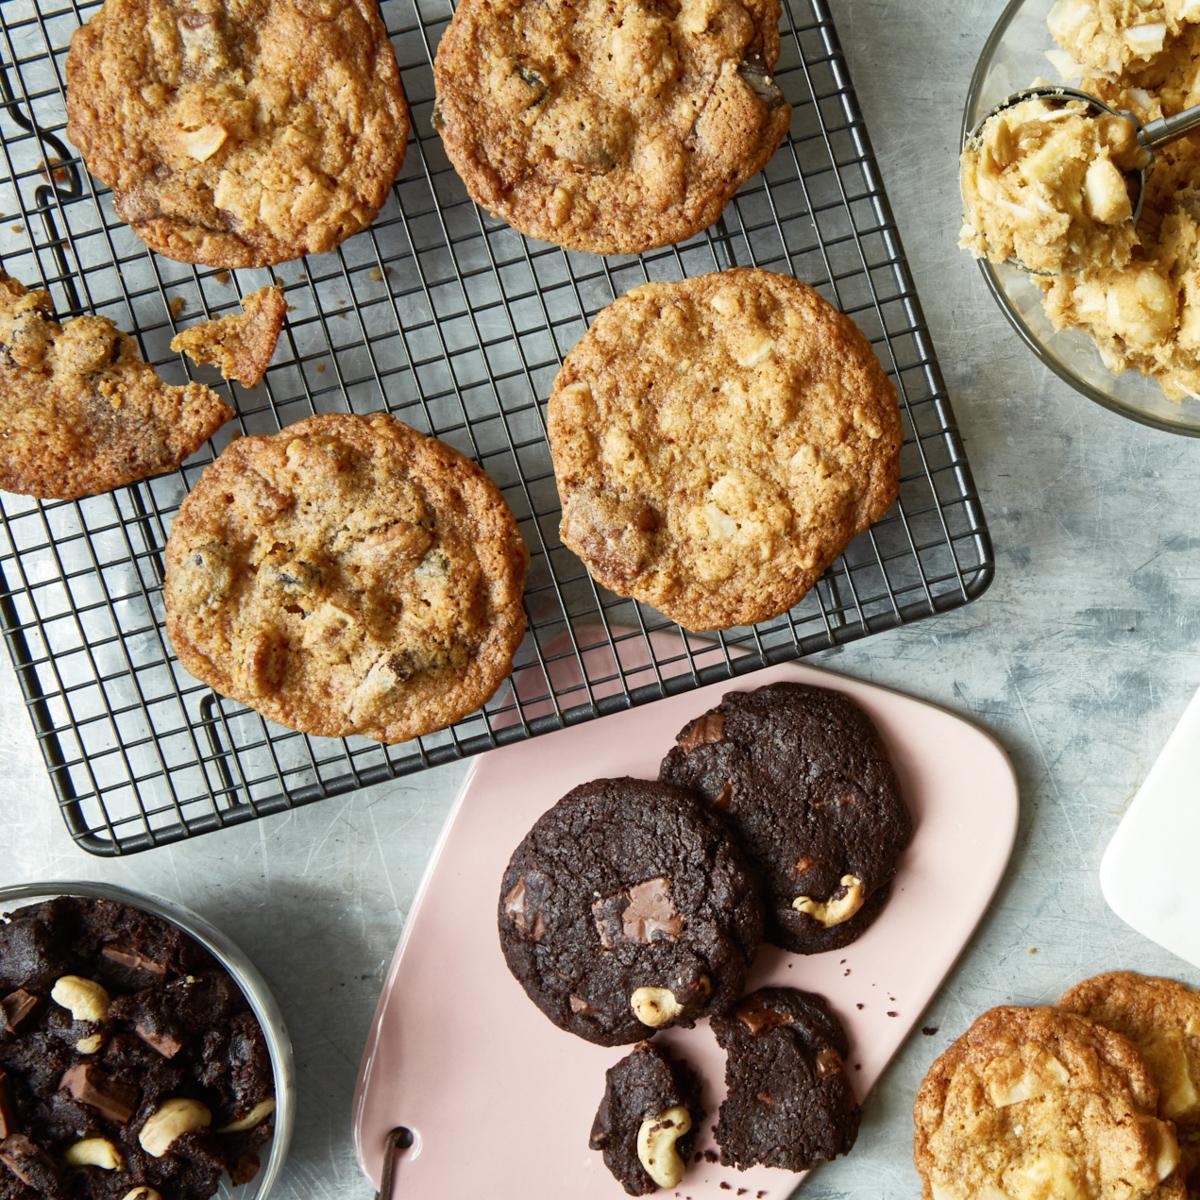 Cookies von Cynthia Barcomi